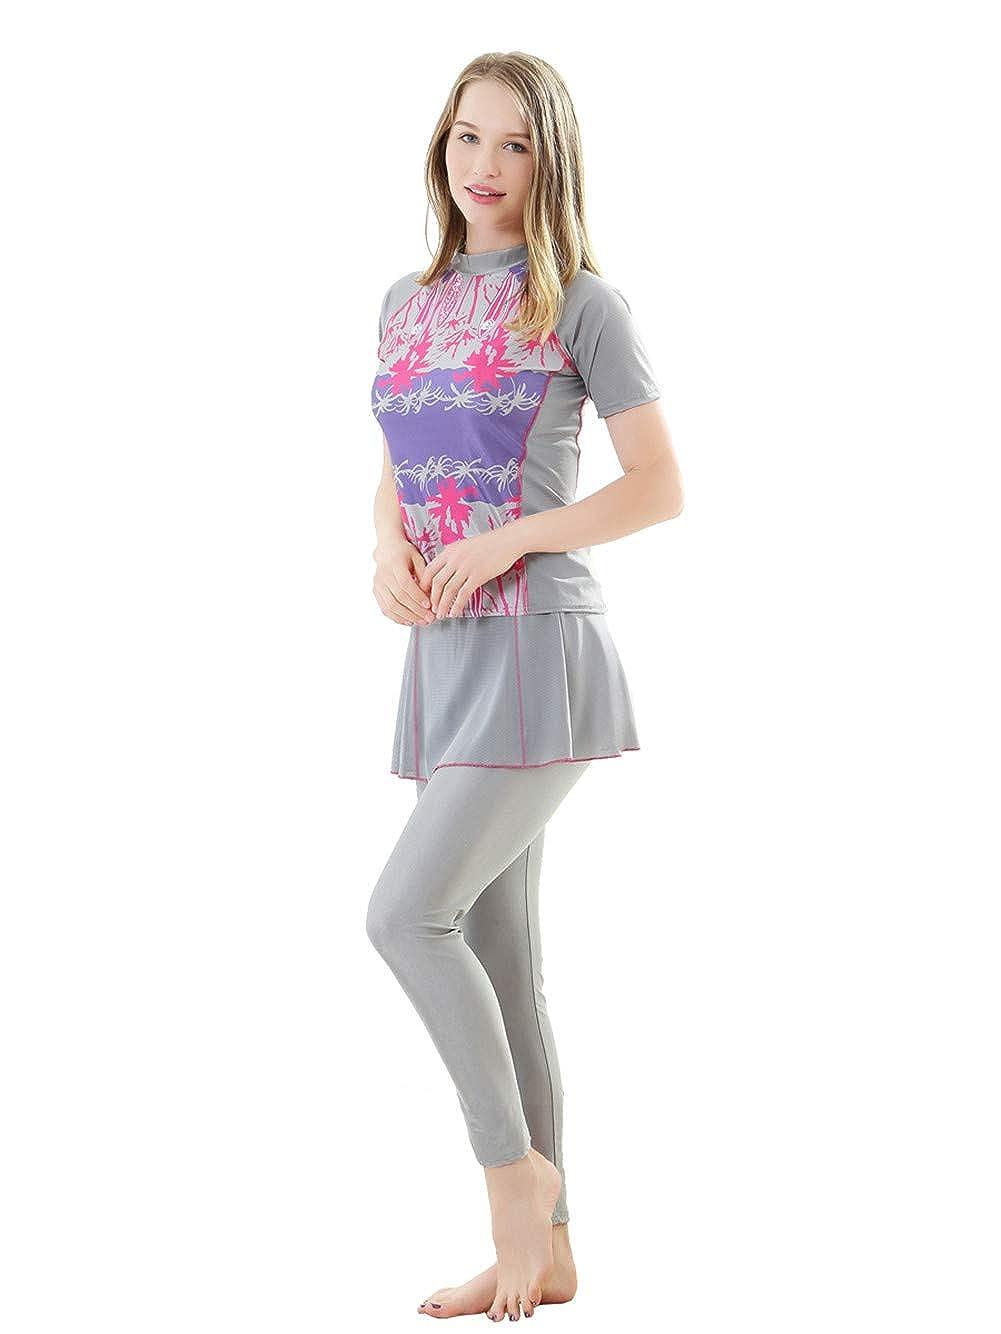 f408de32704 Fortuning s JDS Islamic Short Sleeve Tops Pants Swimsuit Sets Fashion Women  Burkini  Amazon.co.uk  Clothing